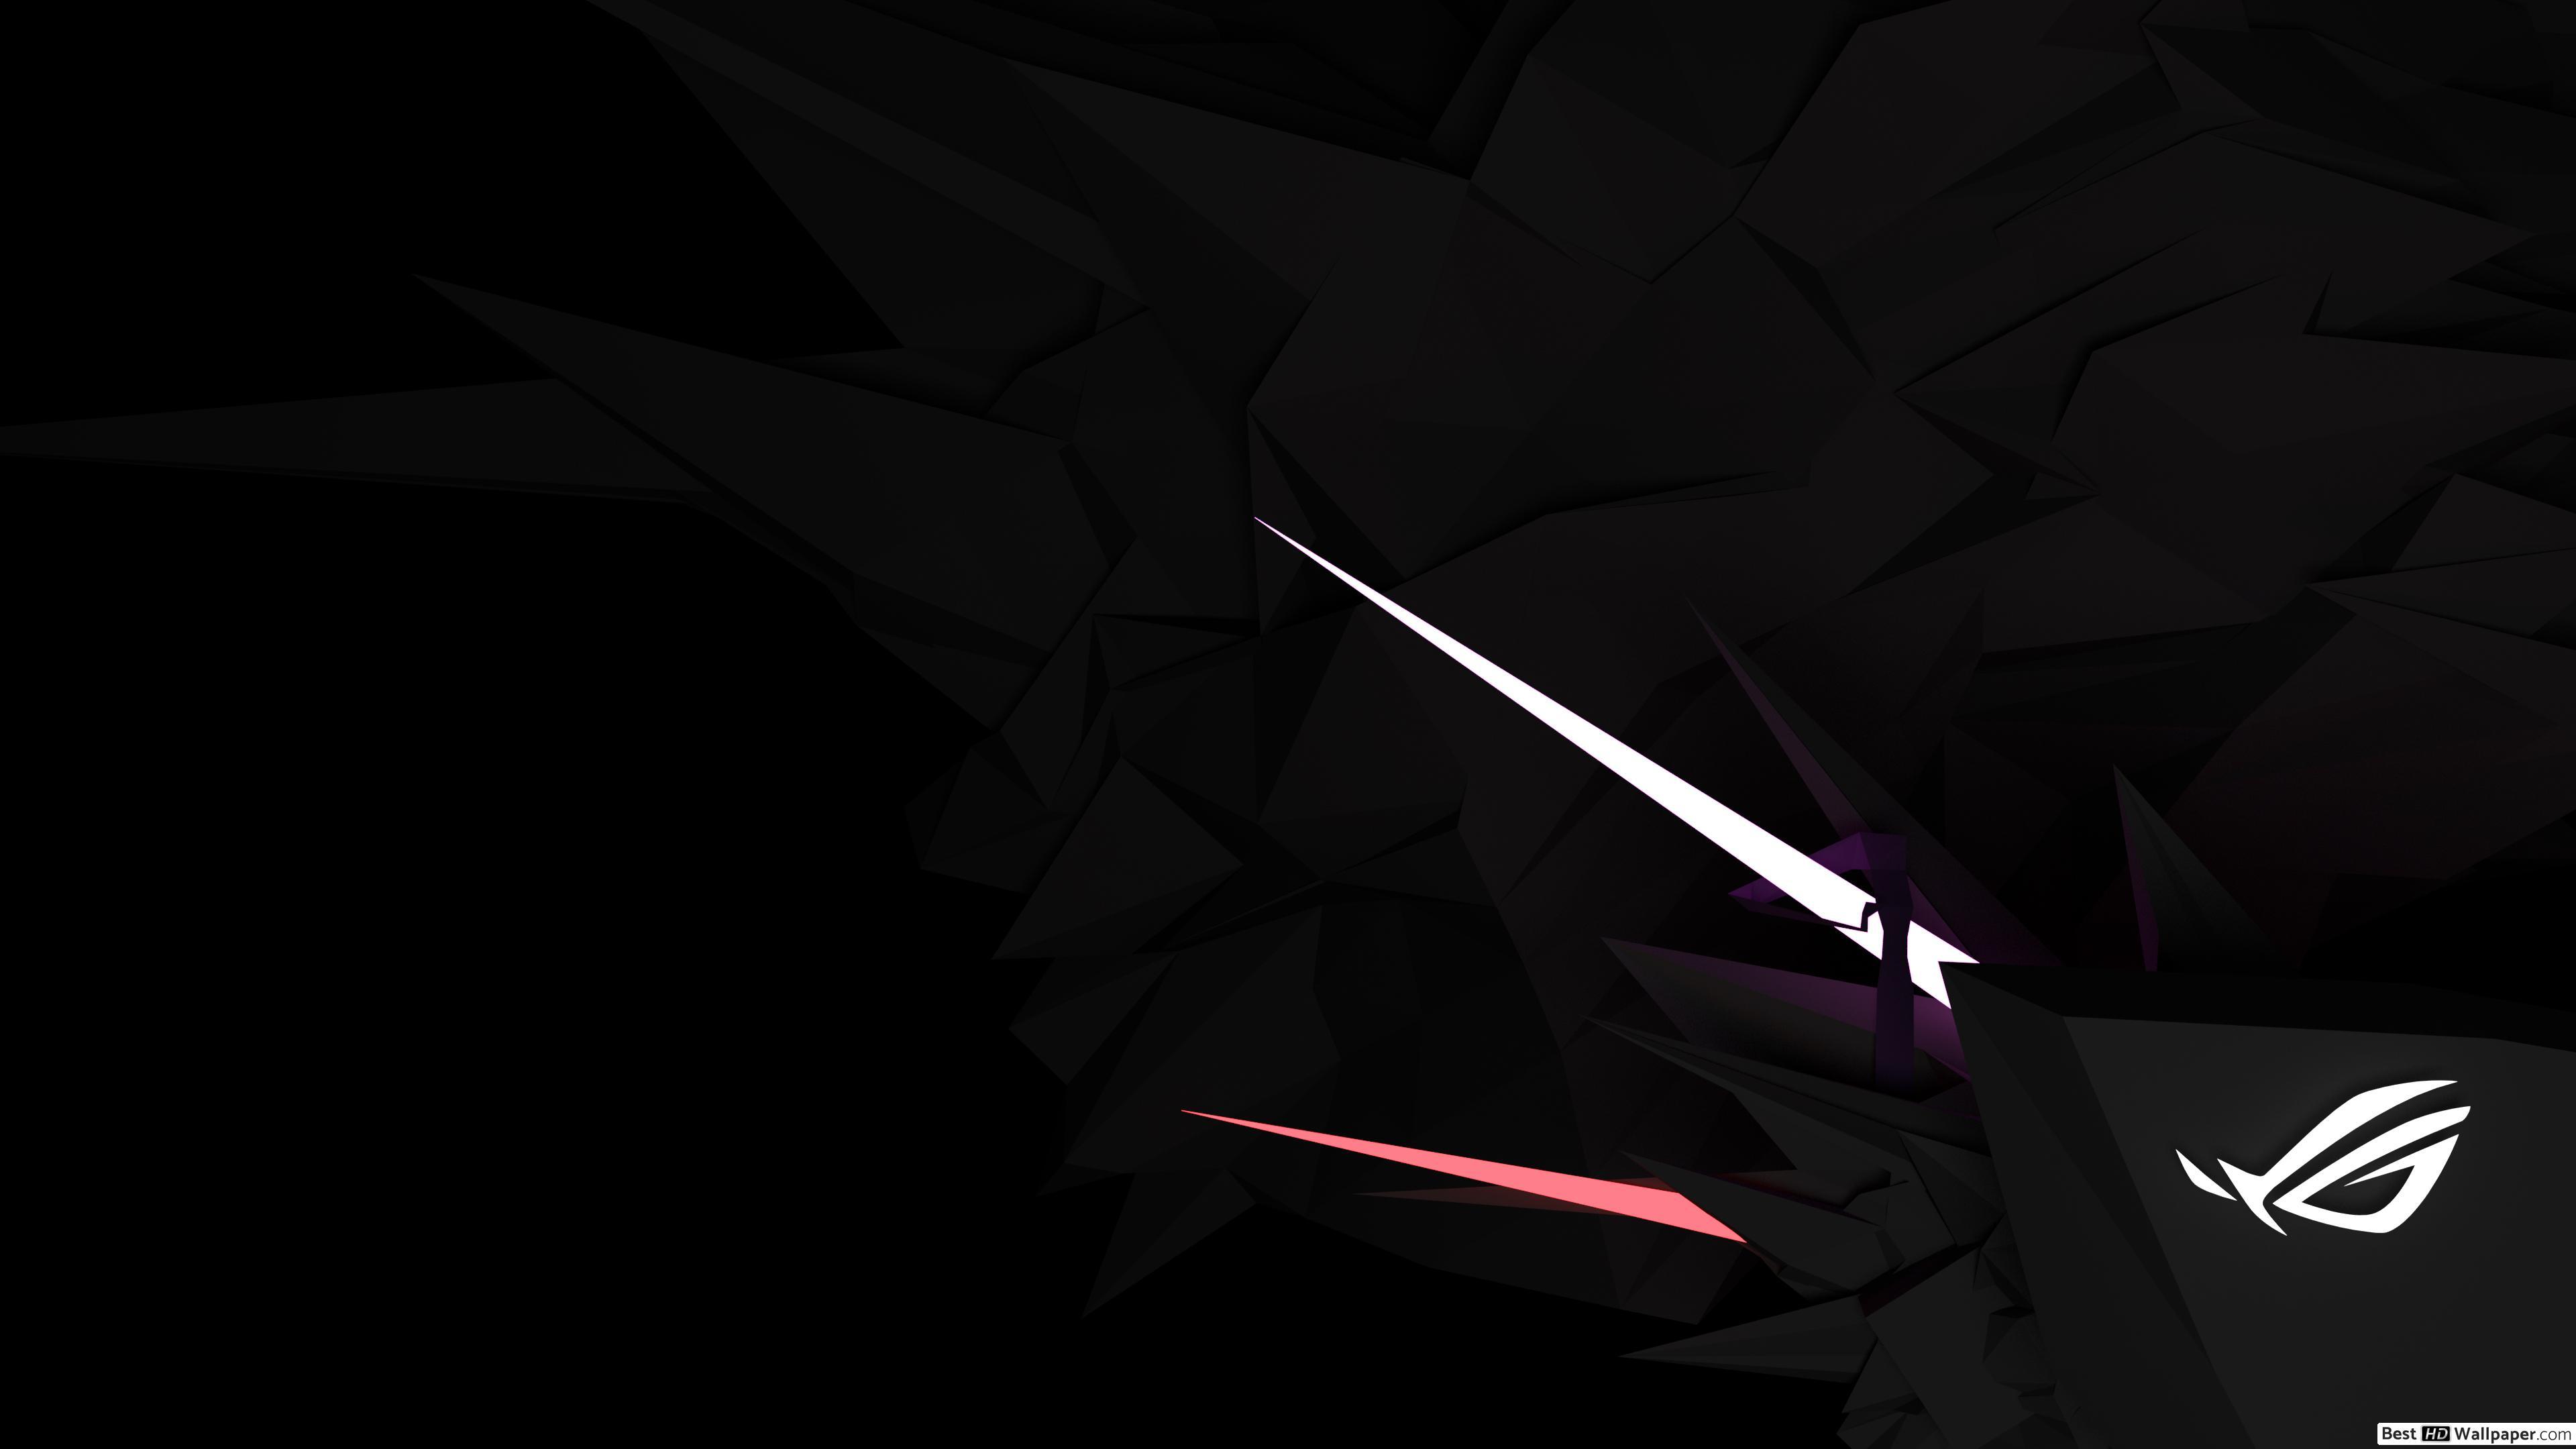 Asus ROG Republic of Gamers   Asus Dark Minimal White LOGO HD 3840x2160